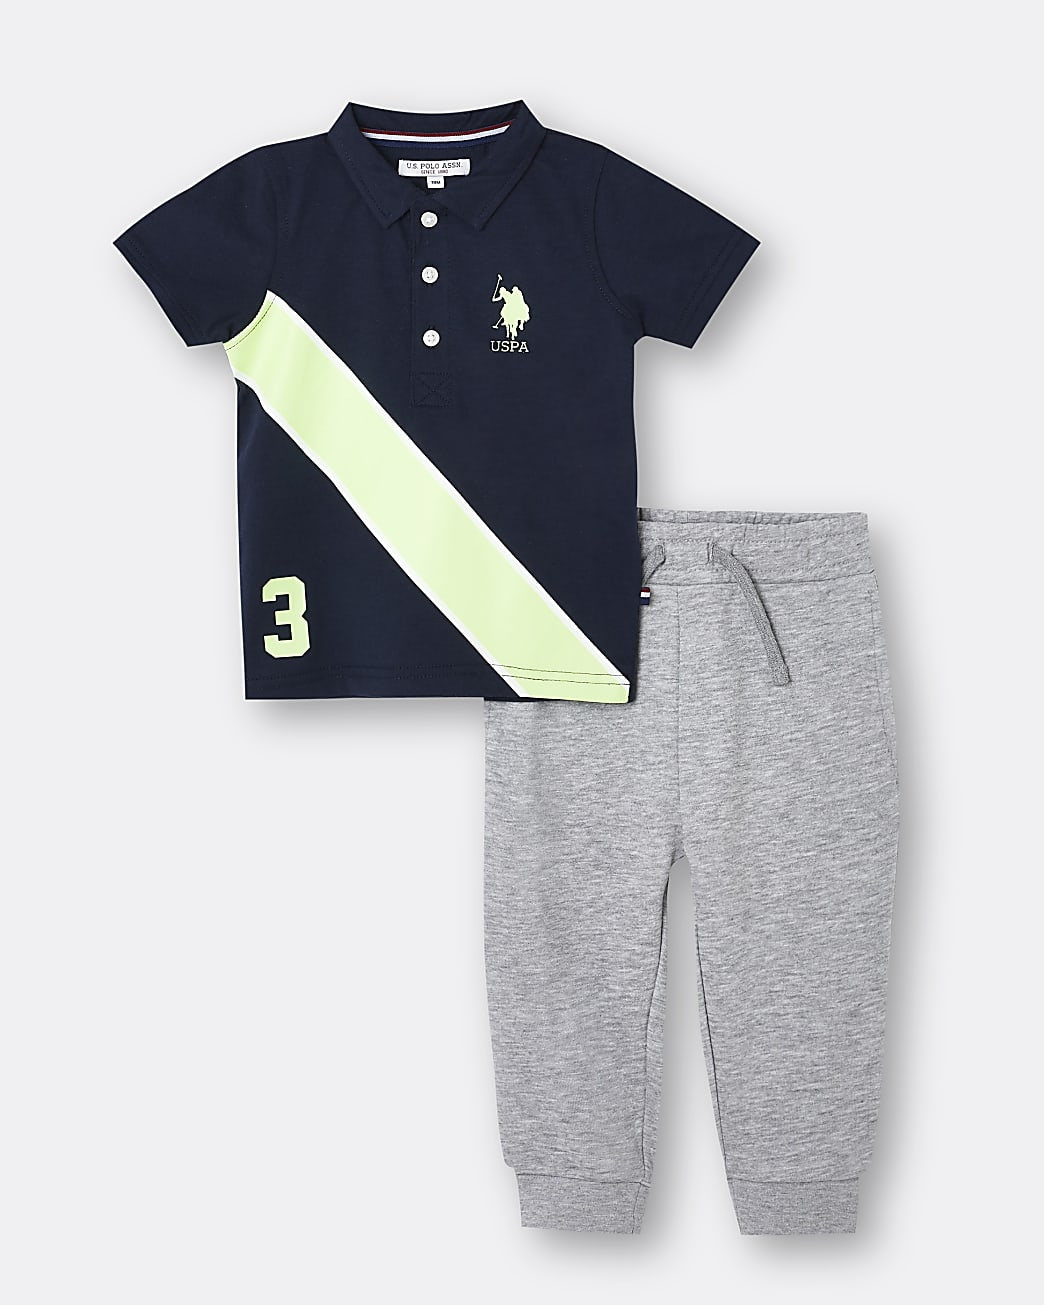 Mini boys navy USPA polo shirt outfit